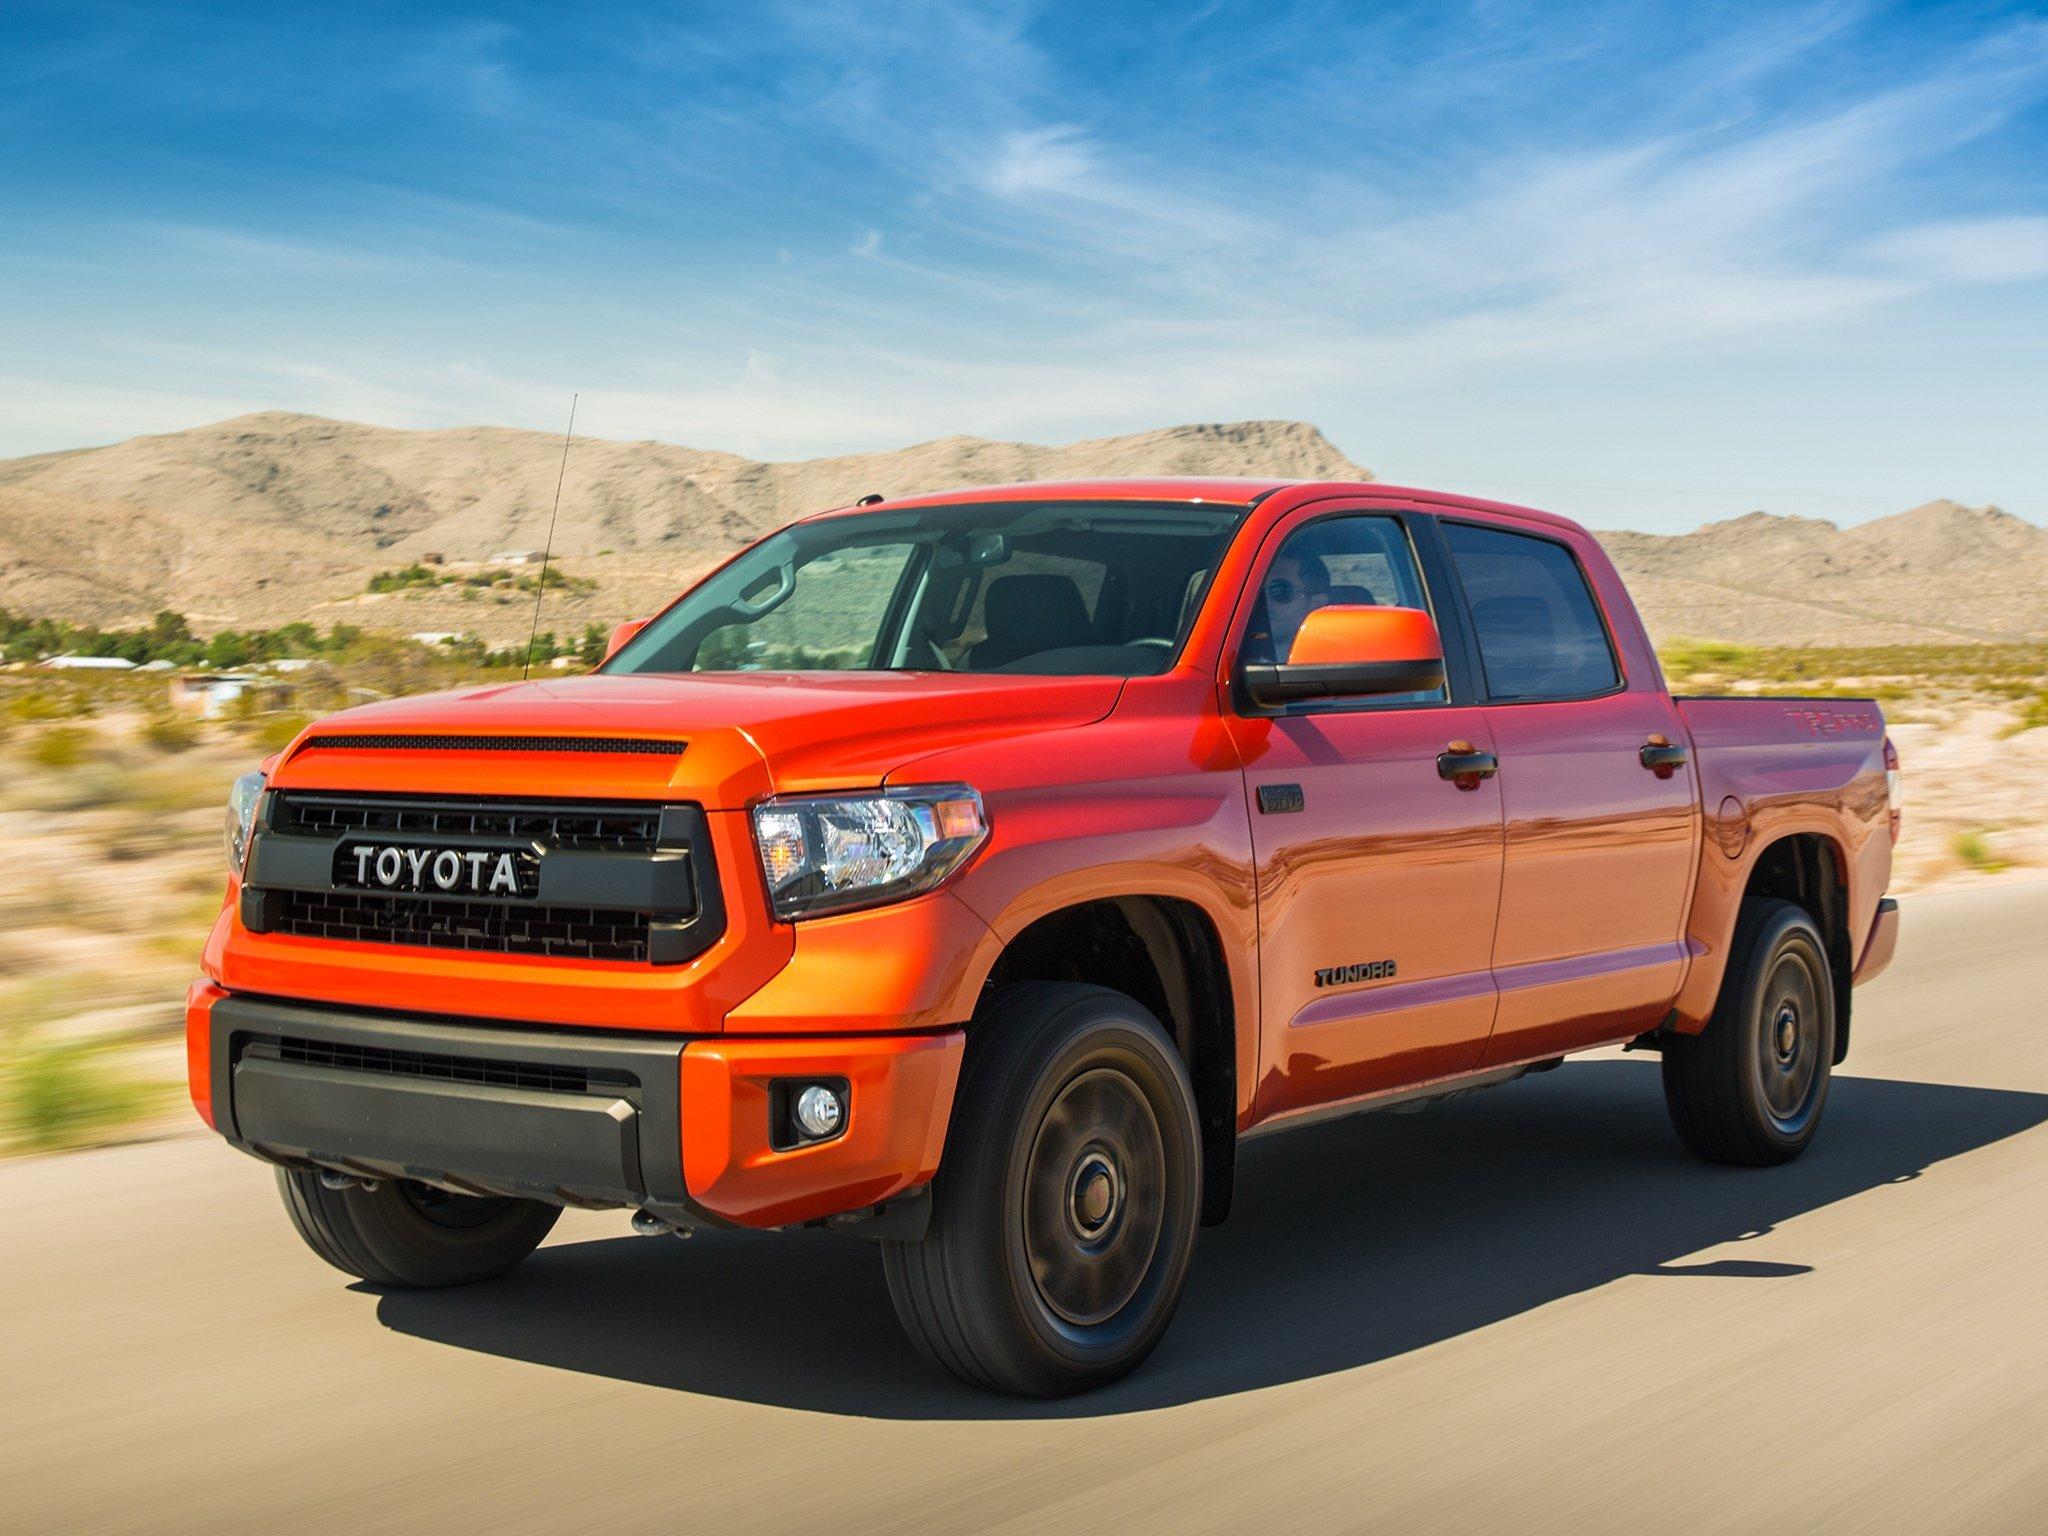 2015 TRD Toyota Tundra Double Cab Pro pickup e wallpaper 2048x1536 2048x1536